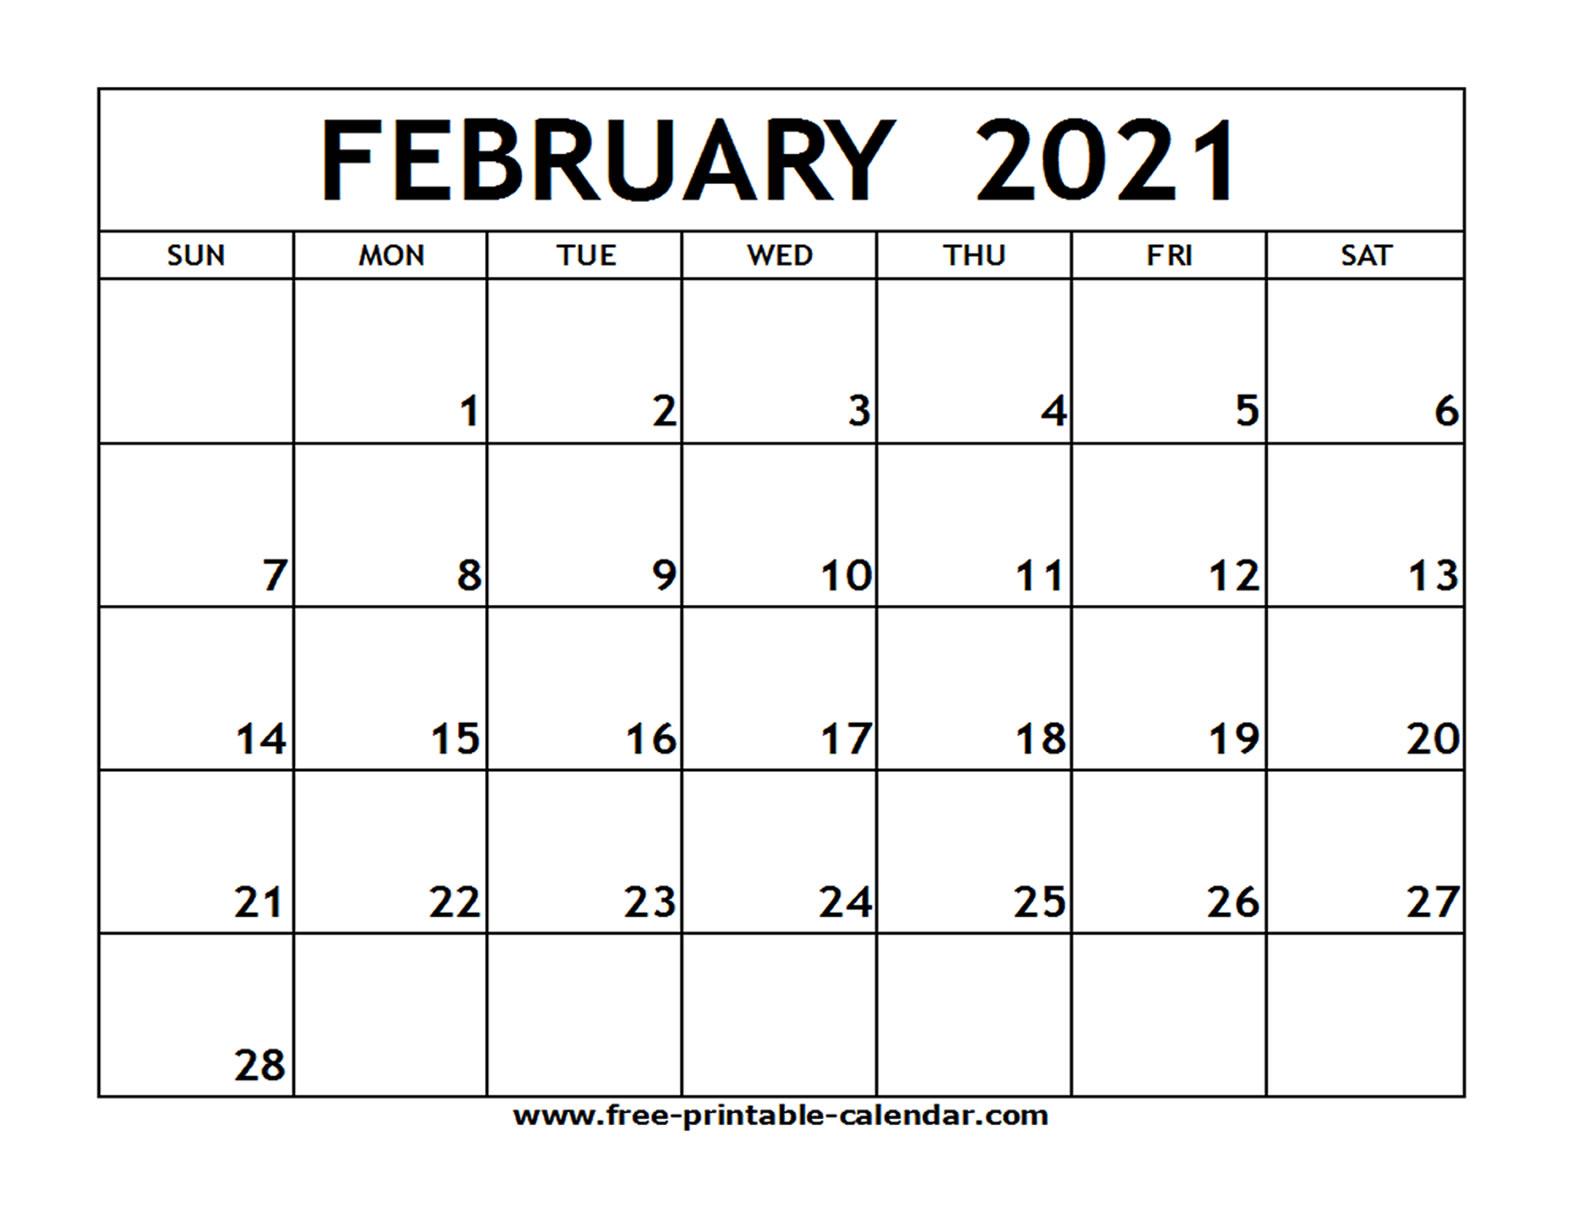 February 2021 Printable Calendar - Free-Printable-Calendar